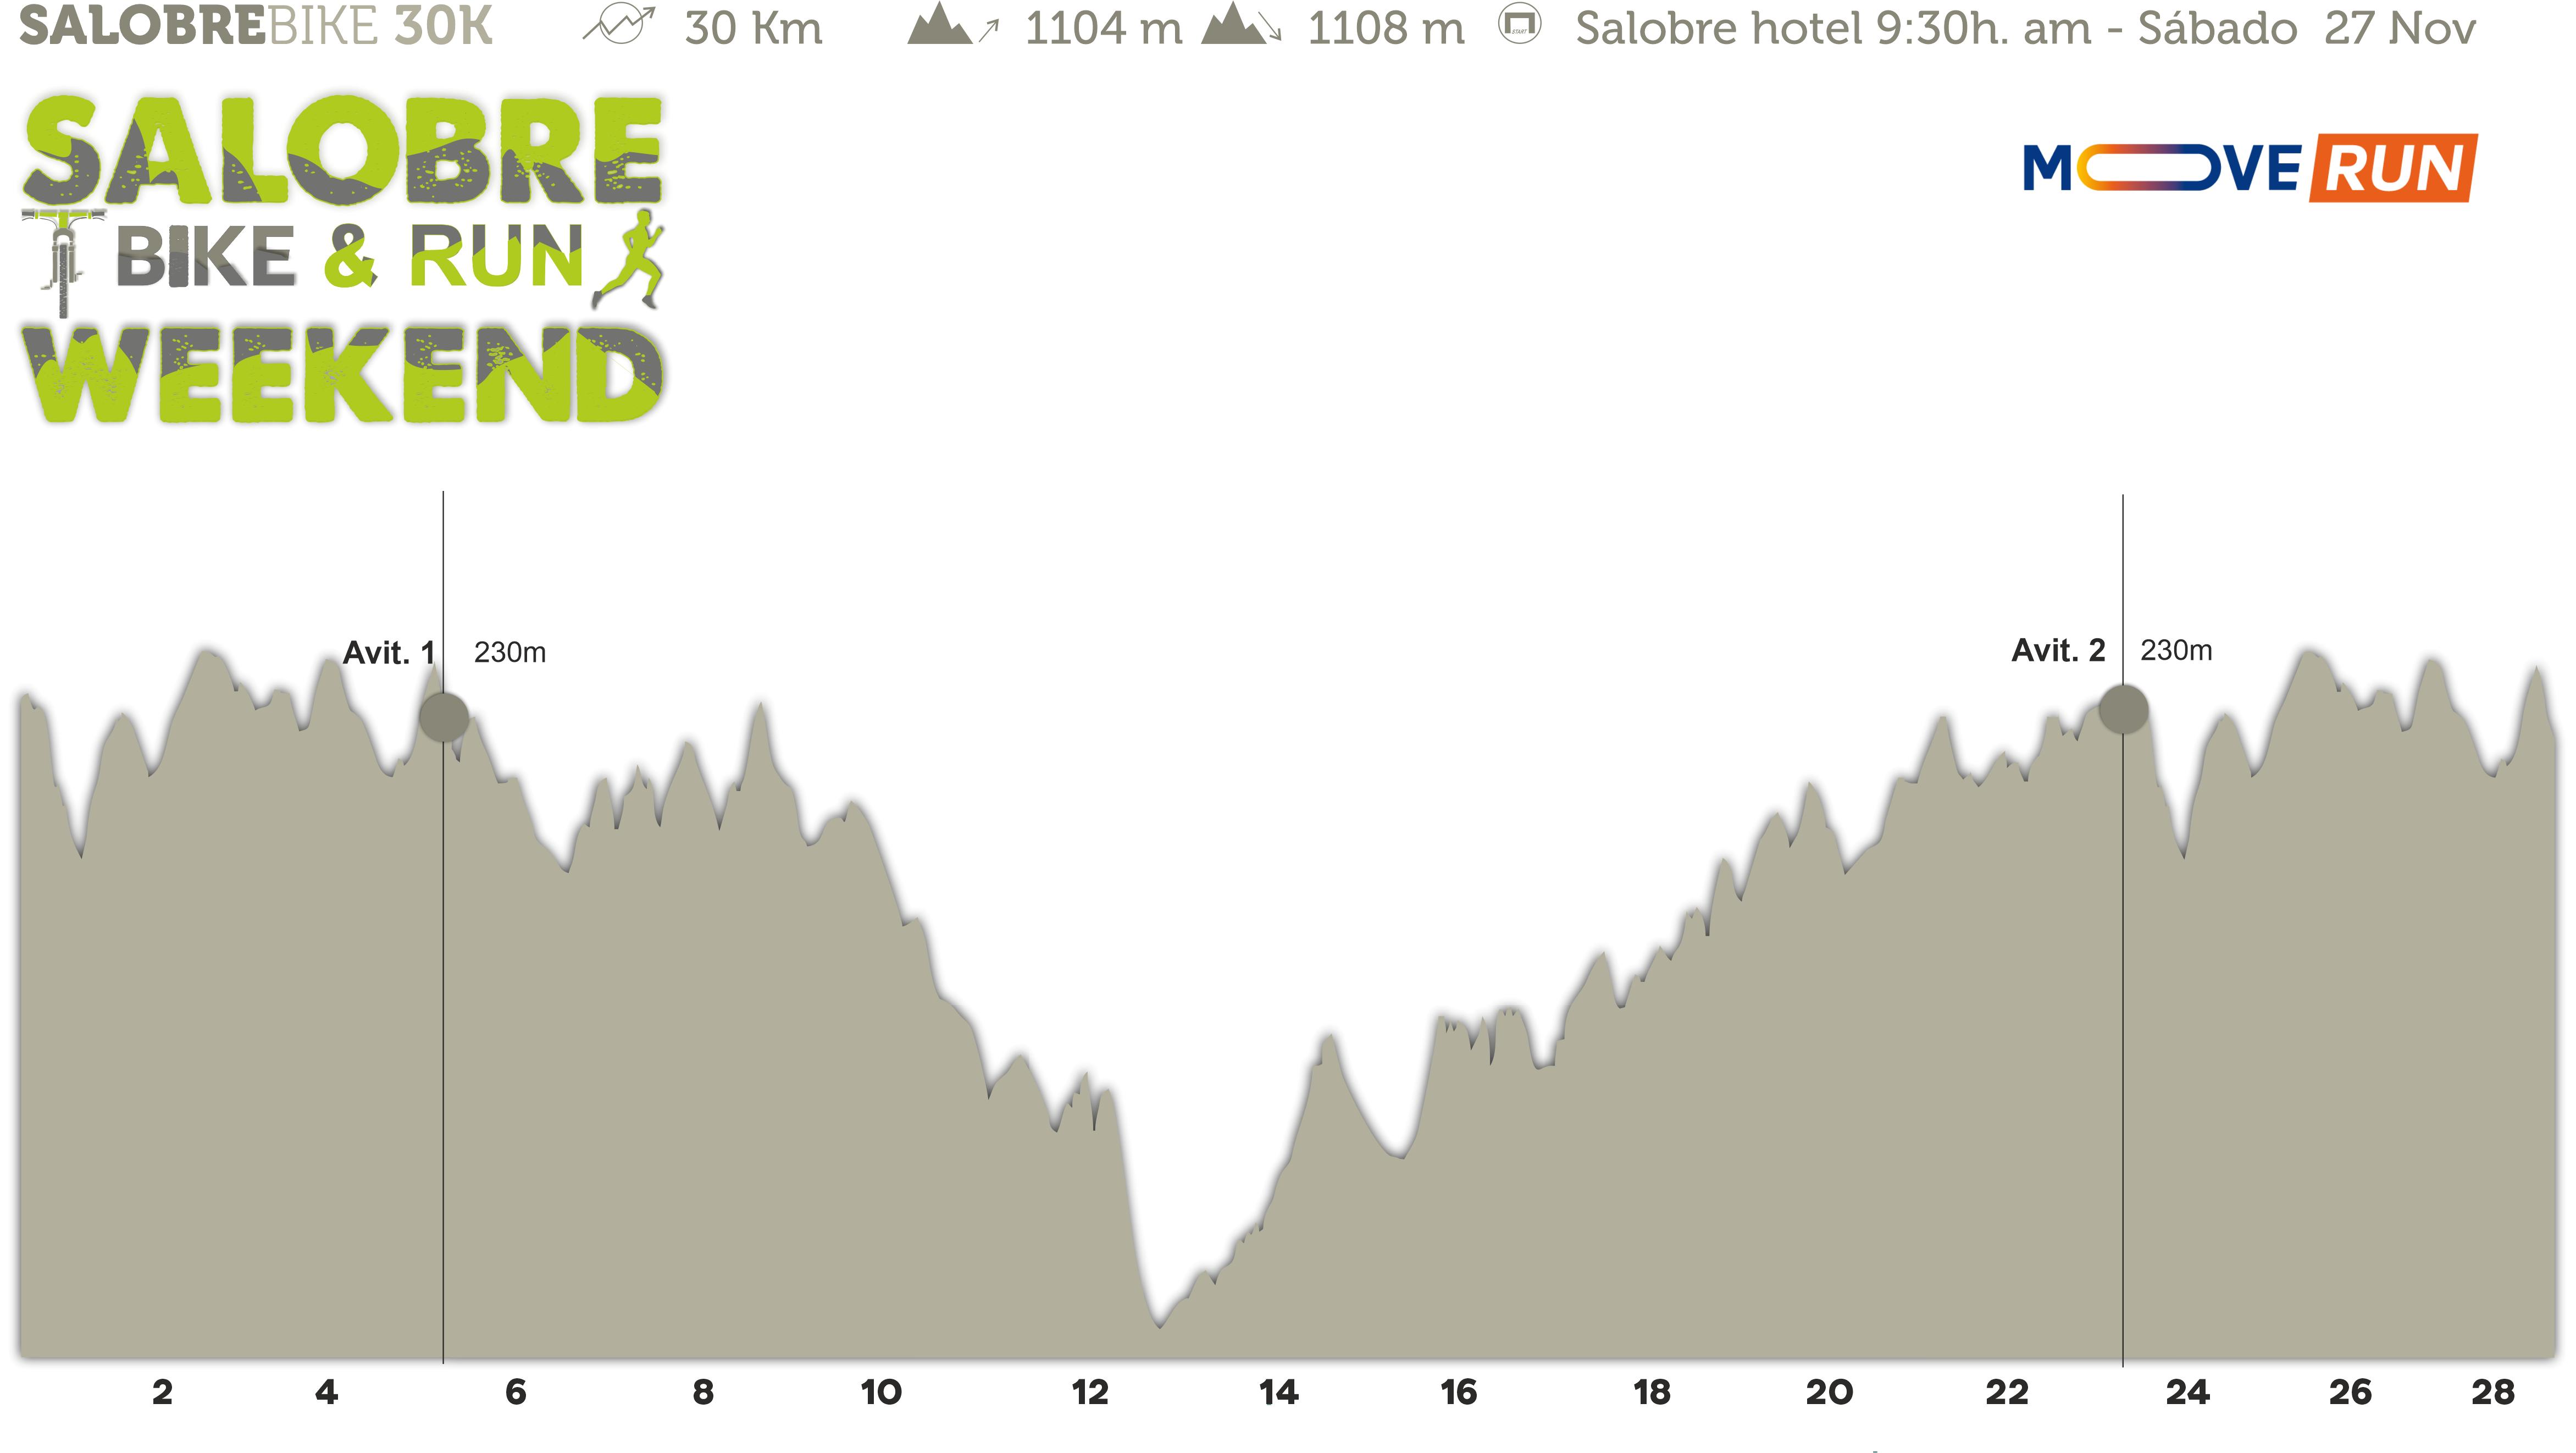 MoveRUN - SALOBRE BIKE&RUN WEEKEND Perfil GREEN30